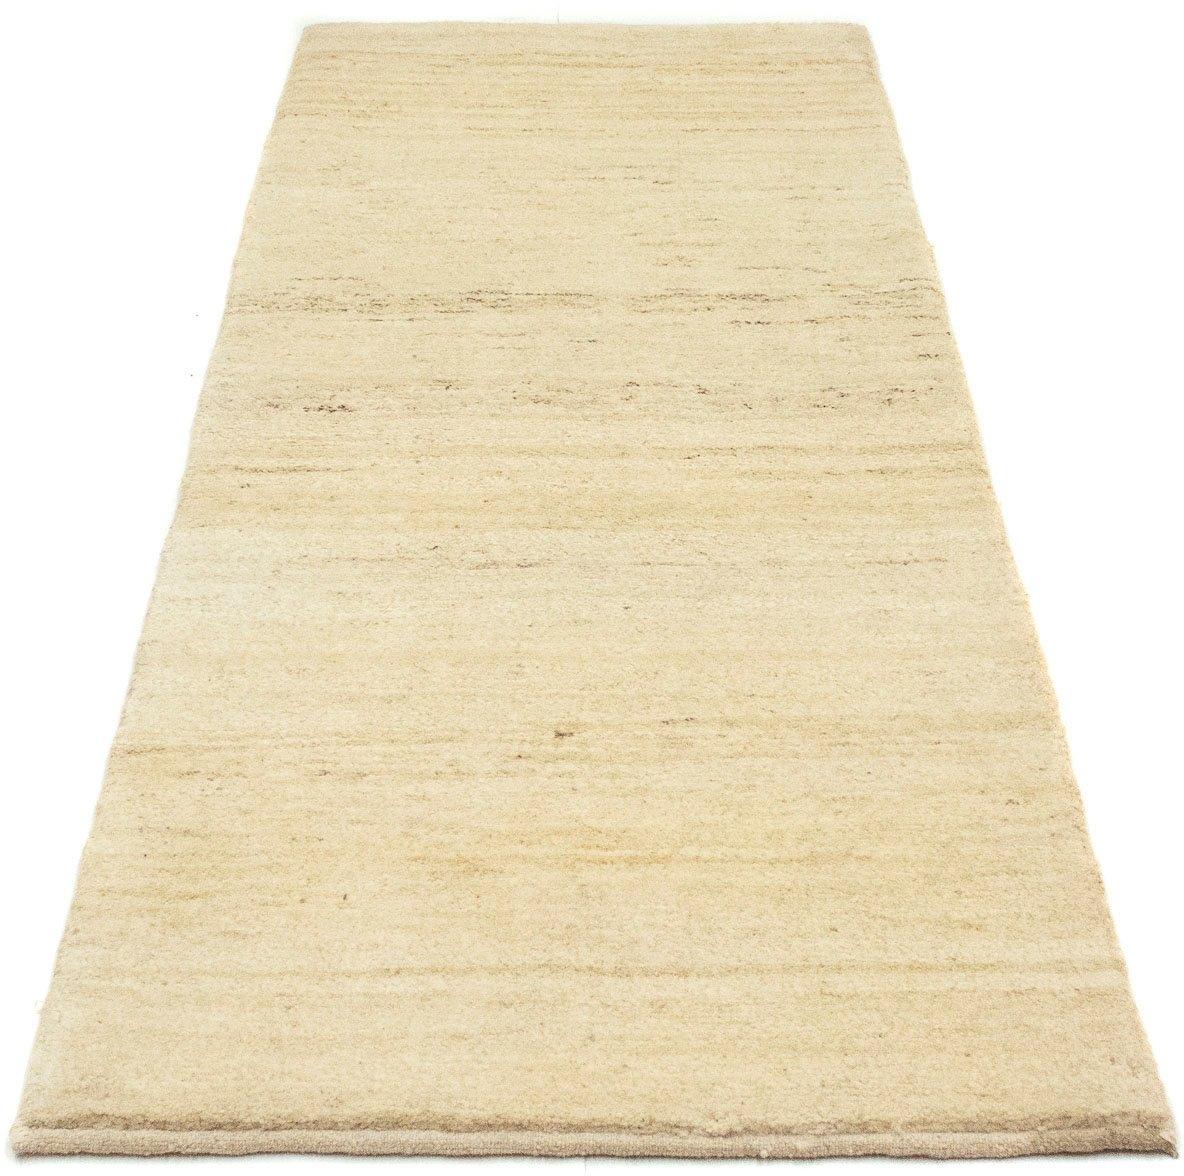 morgenland wollen kleed Gabbeh Teppich handgeknüpft natur handgeknoopt goedkoop op otto.nl kopen